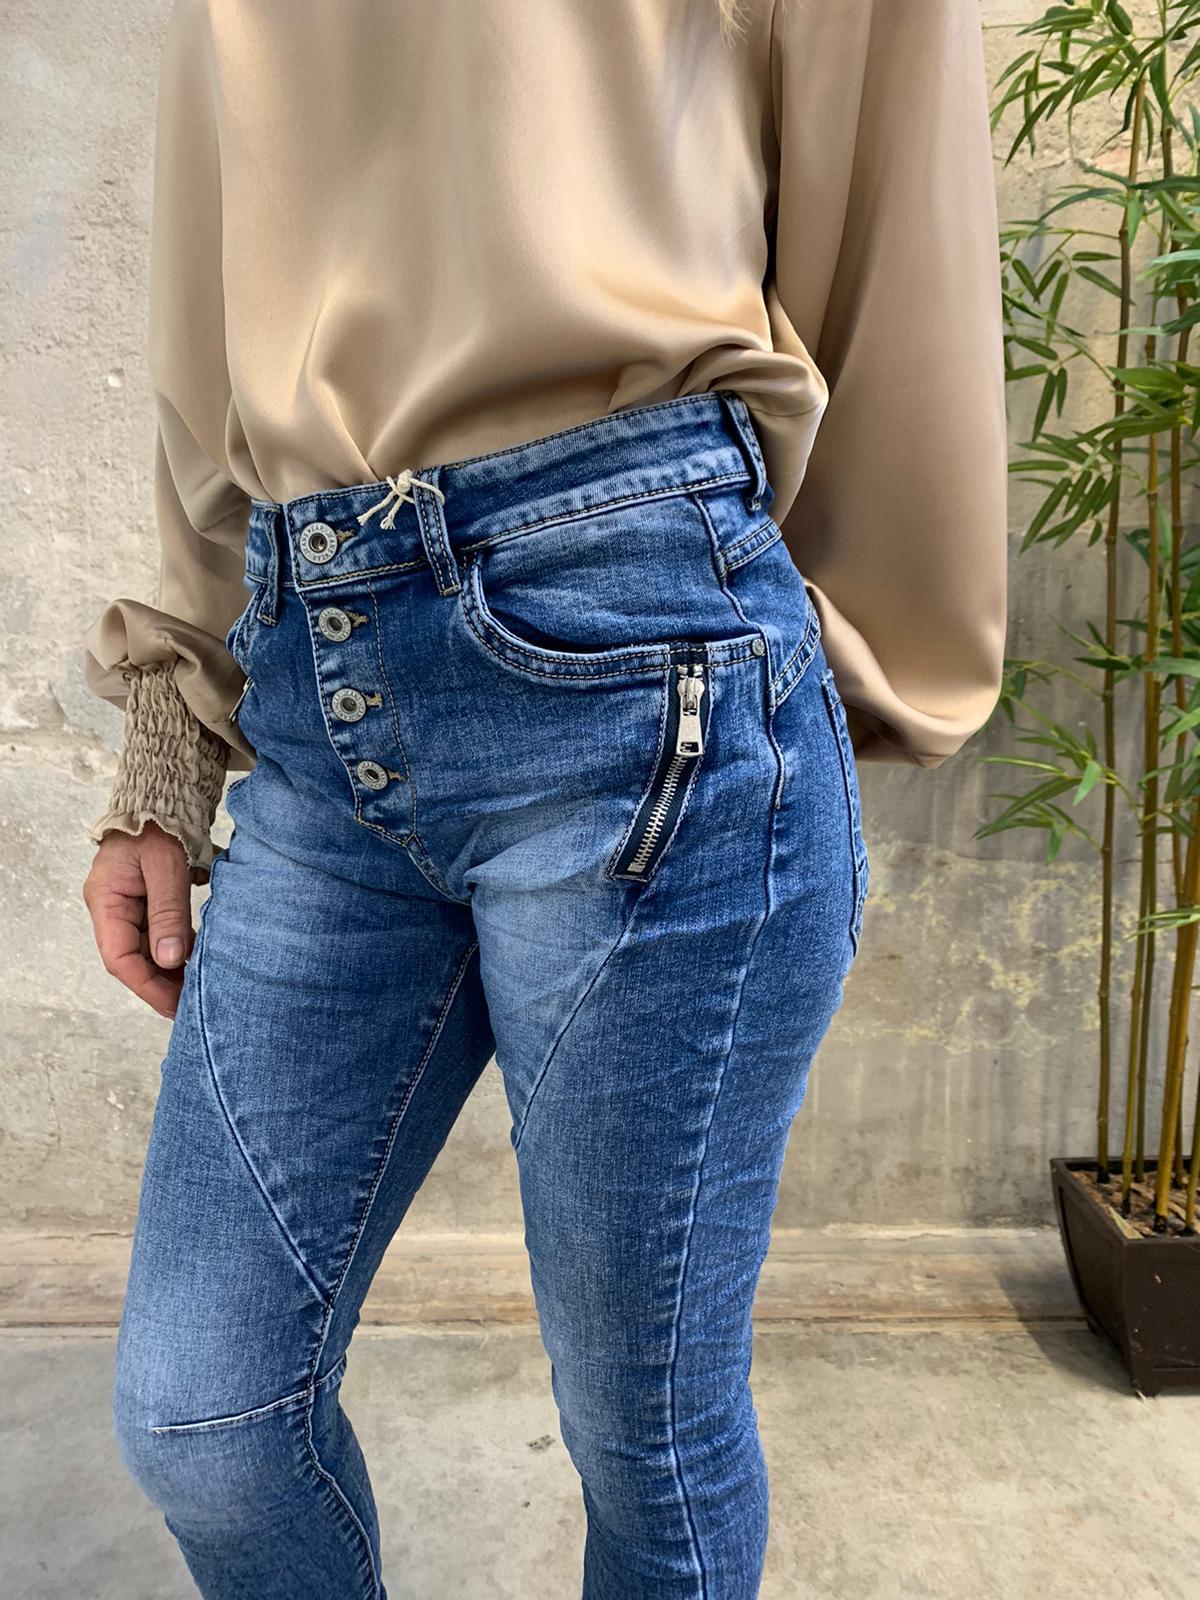 Jeans JW2607 - Dragkedjor - Denim detalj